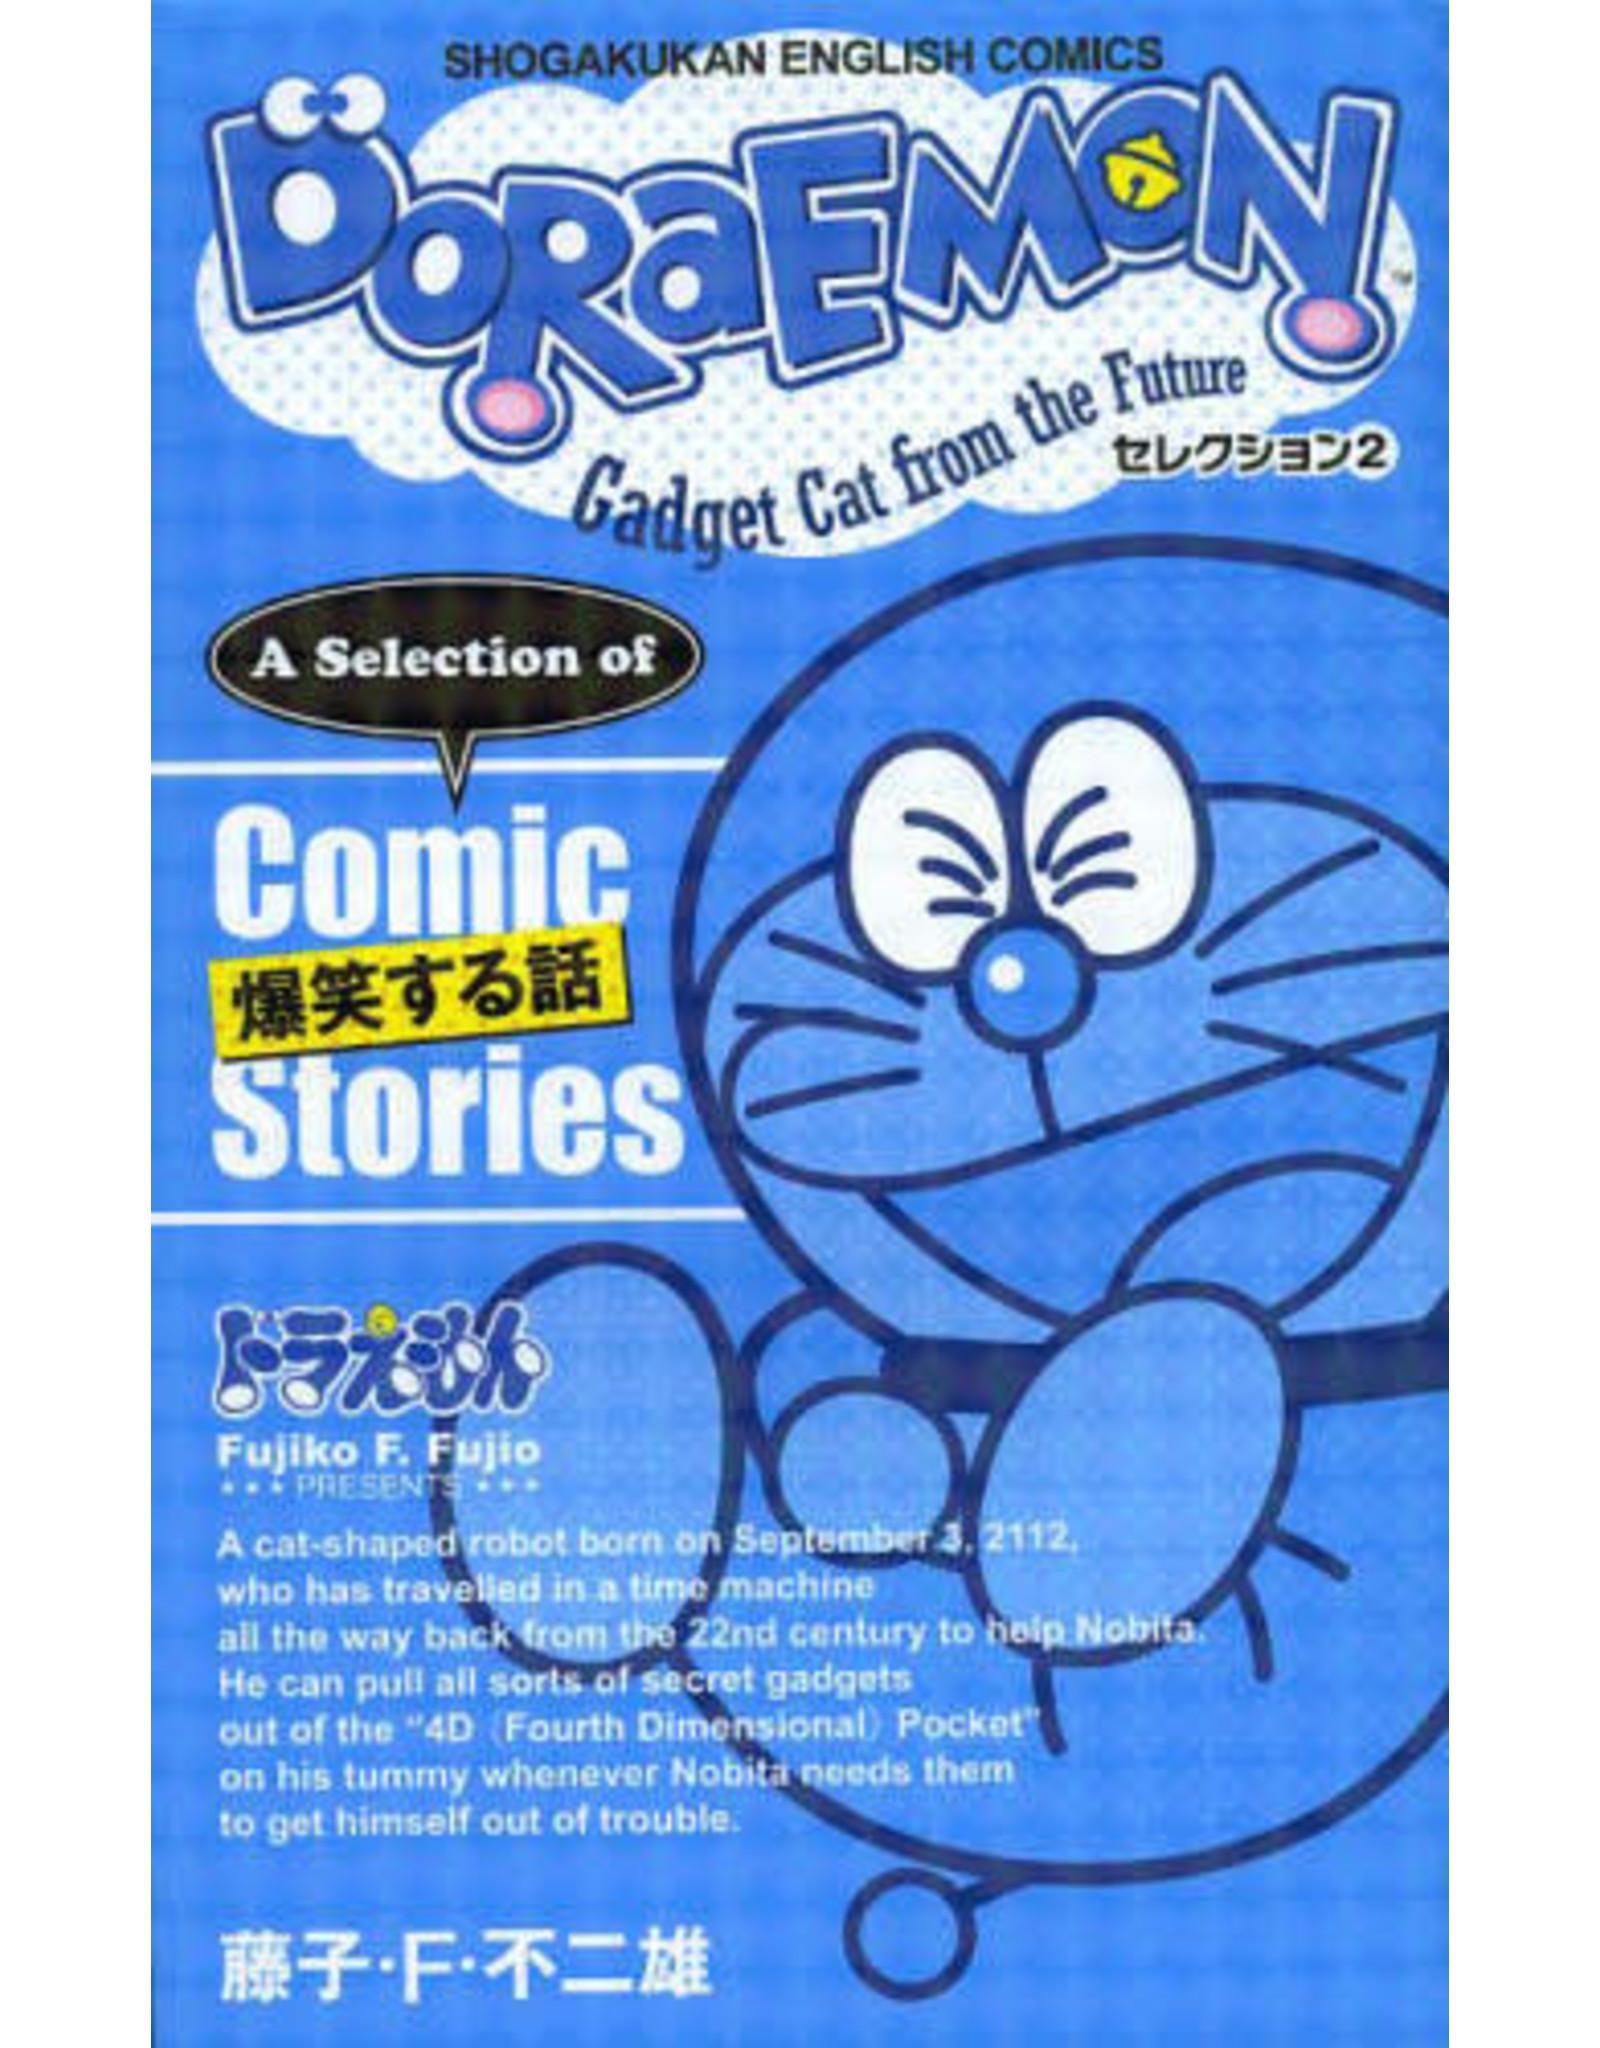 SHOGAKKAN [BILINGUAL] DORAEMON SELECTION 2 COMIC STORIES